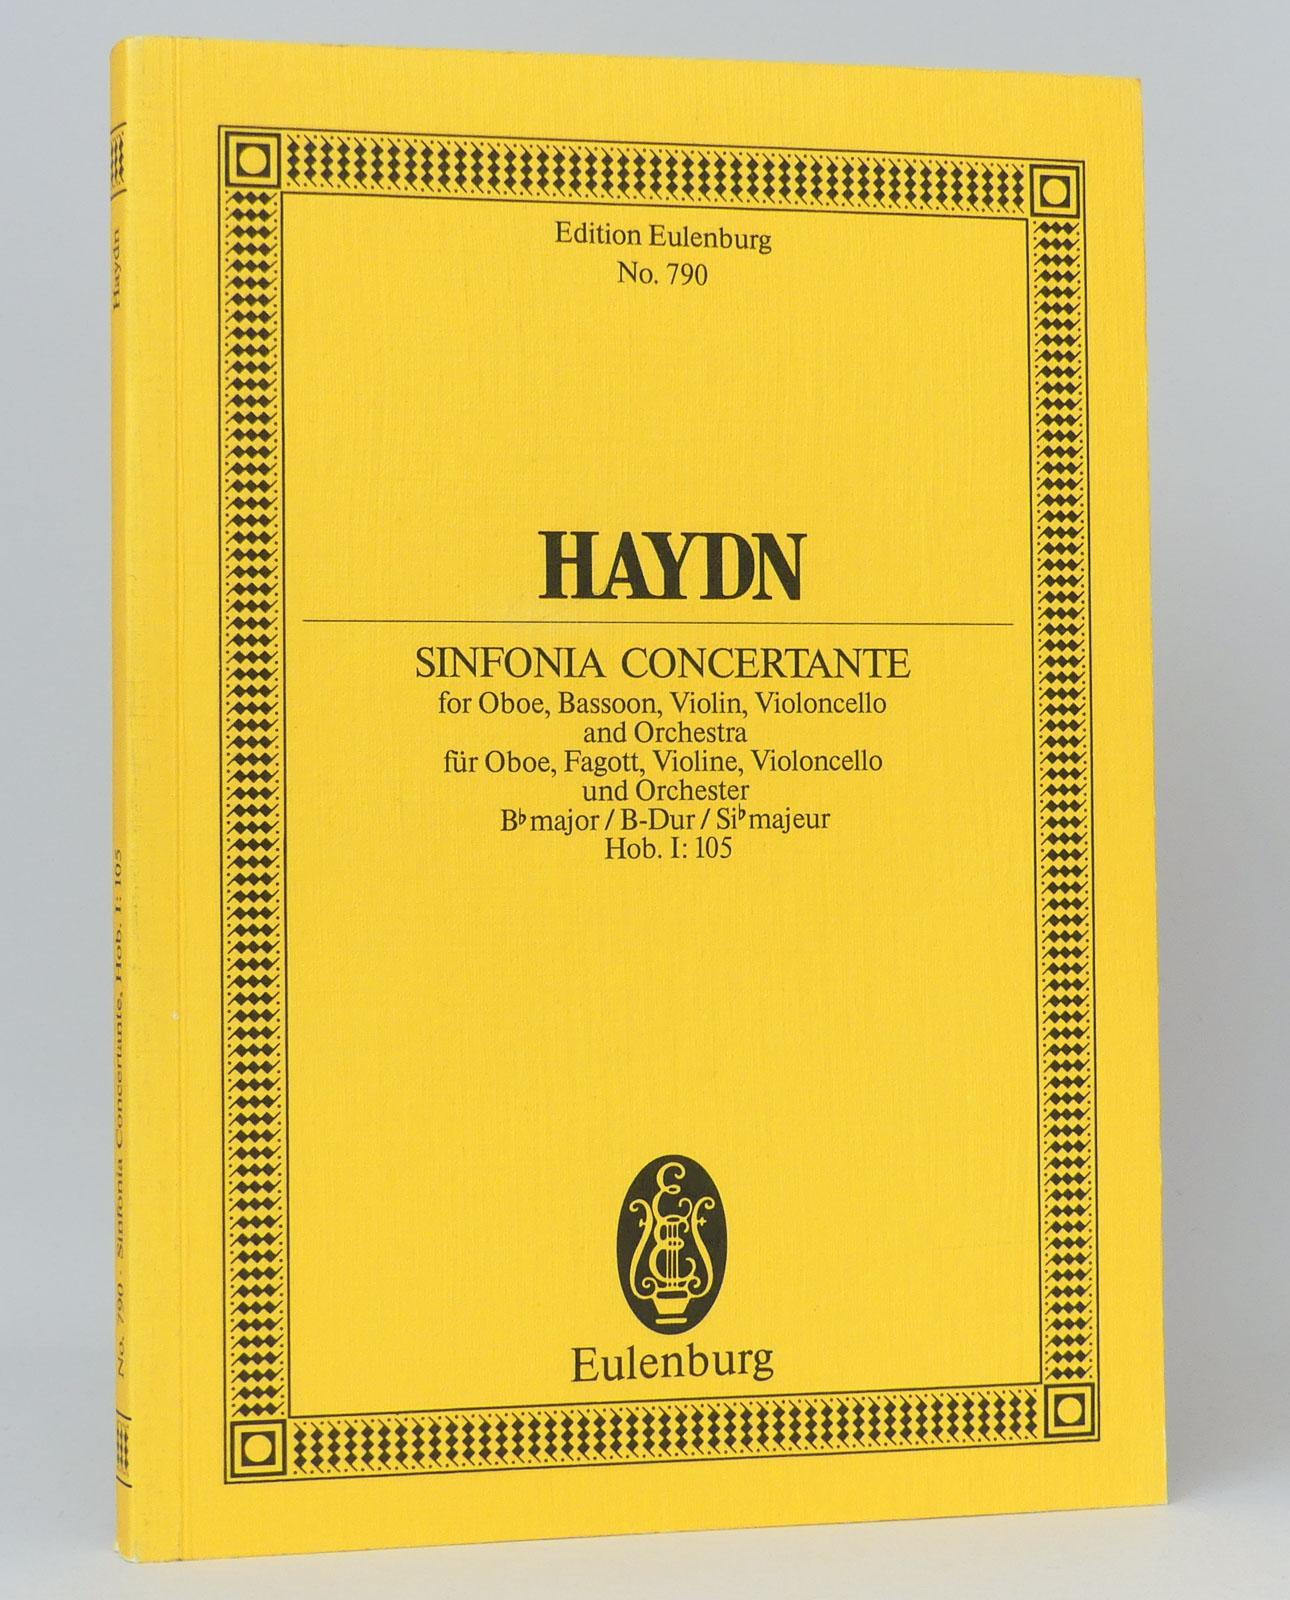 Symphonie Concertante für Oboe, Fagott, Violine, Violoncello und Orchester B-Dur: Hob. I: 105 : Studienpartitur : (Reihe: Edition Eulenburg, No. 790) - Haydn, Joseph Landon, Christa [Hg.]